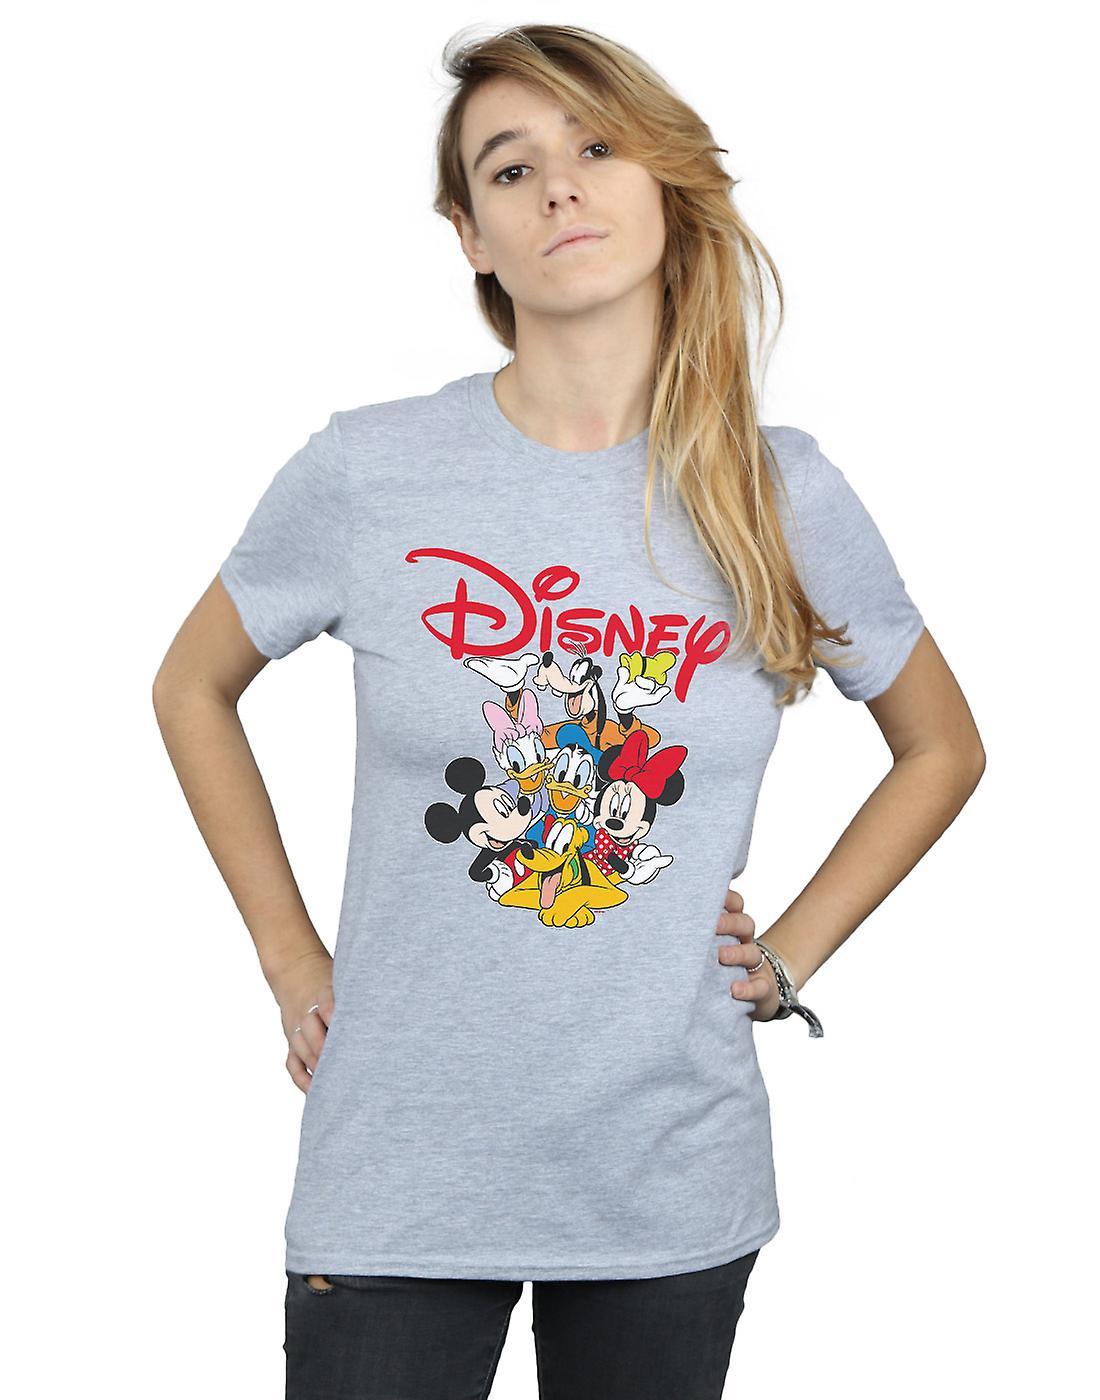 Disney Women's Mickey Mouse Crew Boyfriend Fit T-Shirt